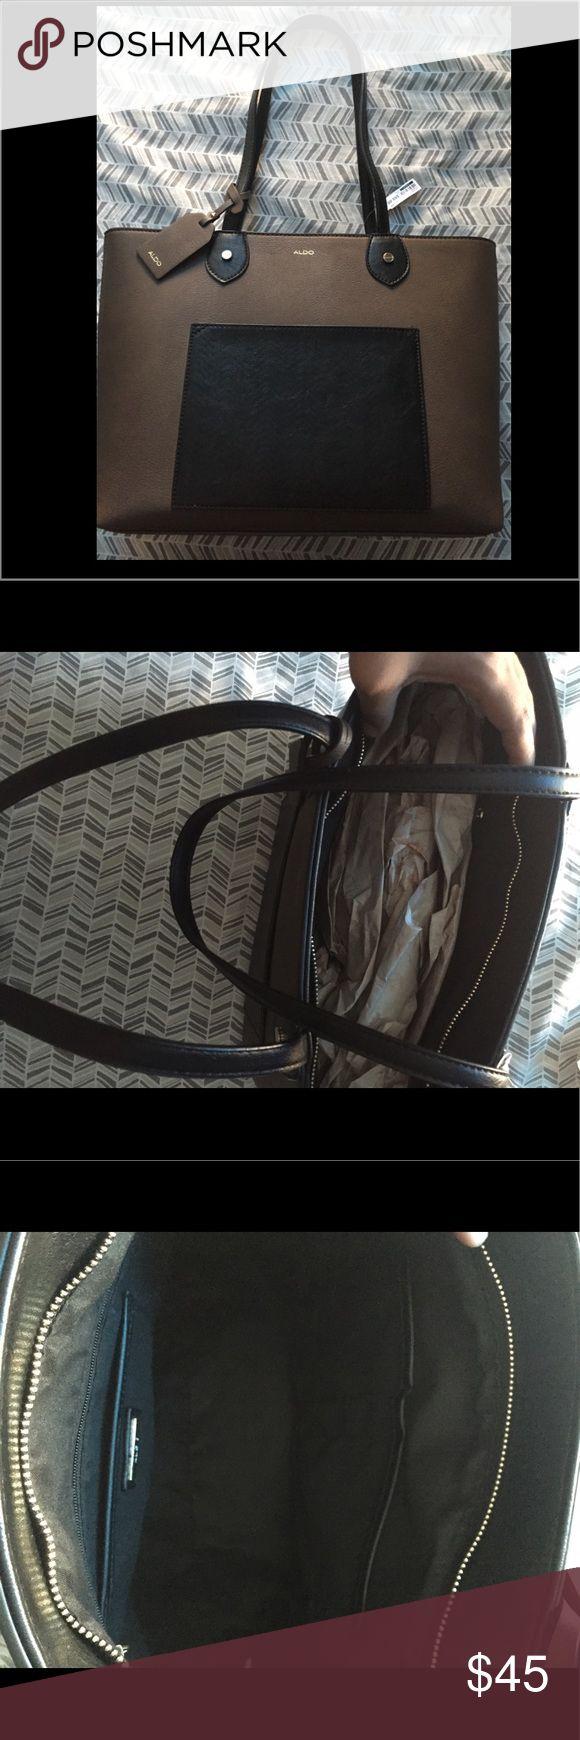 Aldo tote bag **Color Block** Brand New!! Aldo tote bag. Retail price 60.00 Aldo Bags Totes